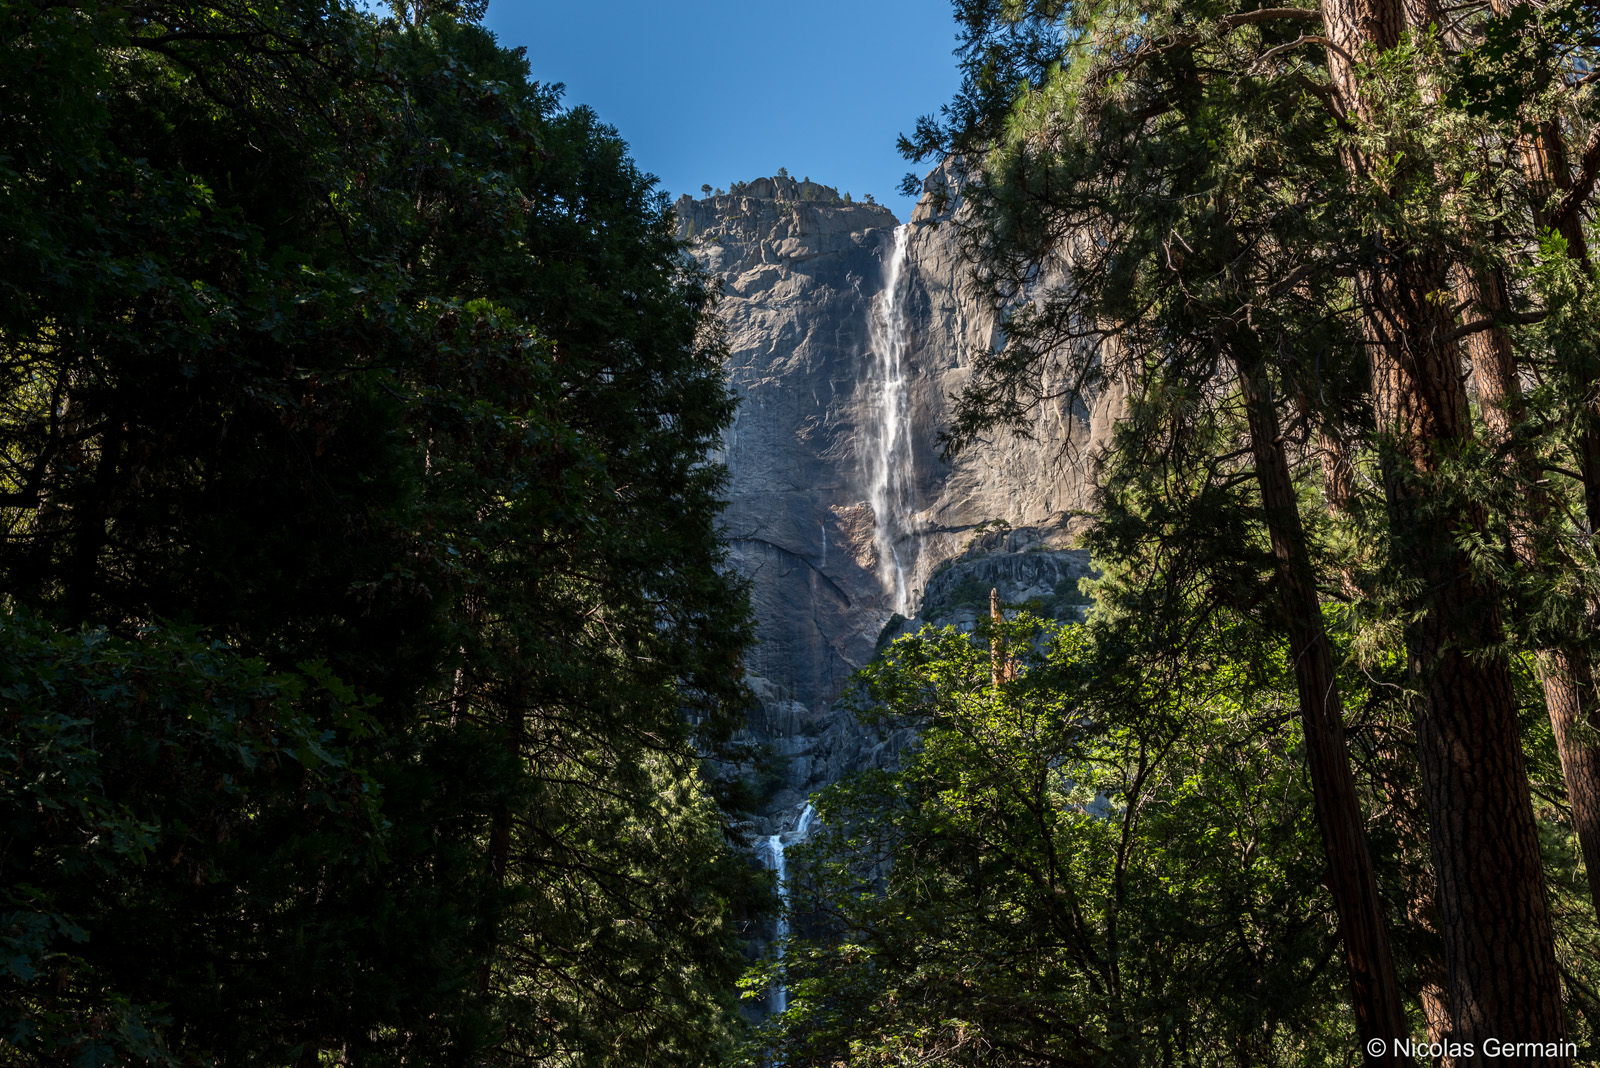 Upper et Lower Yosemite Falls plongent de 739 mètres, Yosemite National Park